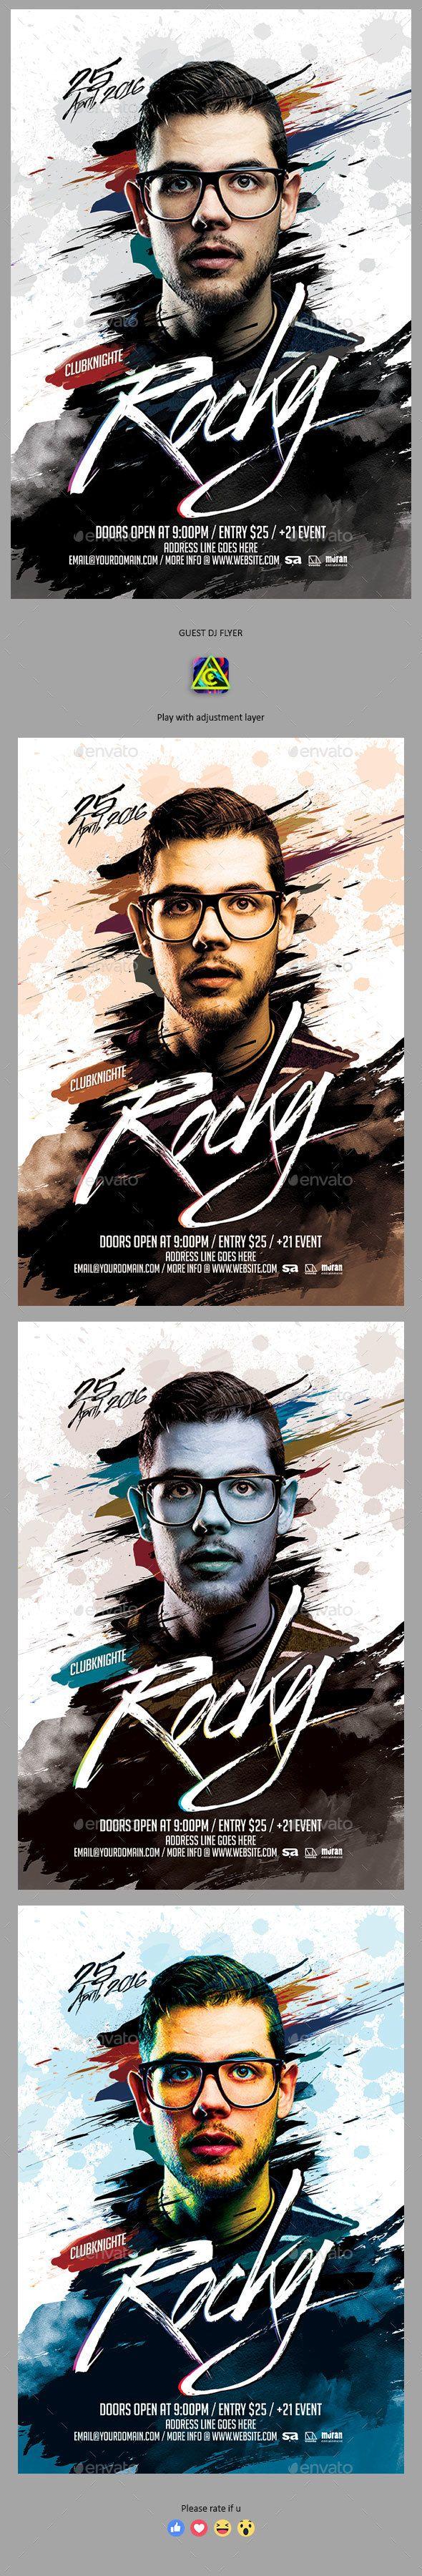 Guest DJ Flyer — Photoshop PSD #festival #artistic • Download ➝ https://graphicriver.net/item/guest-dj-flyer/19657332?ref=pxcr